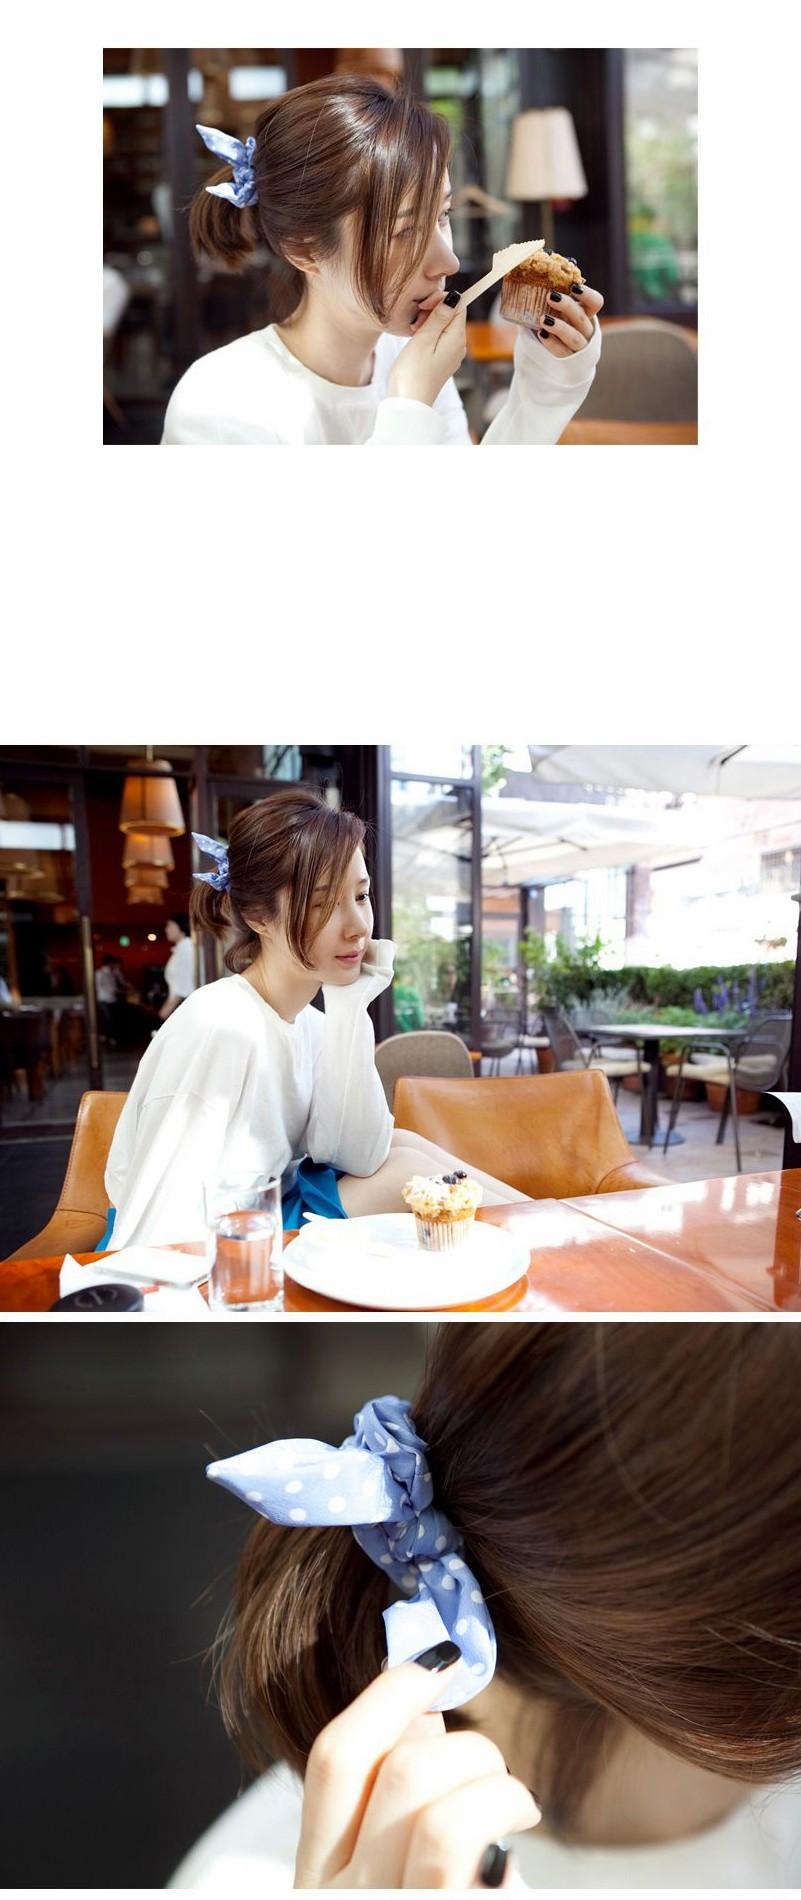 HTB1yfJOKXXXXXcmXXXXq6xXFXXXD Cute Polka Dot Rabbit Ears Hair Tie For Women - Various Styles